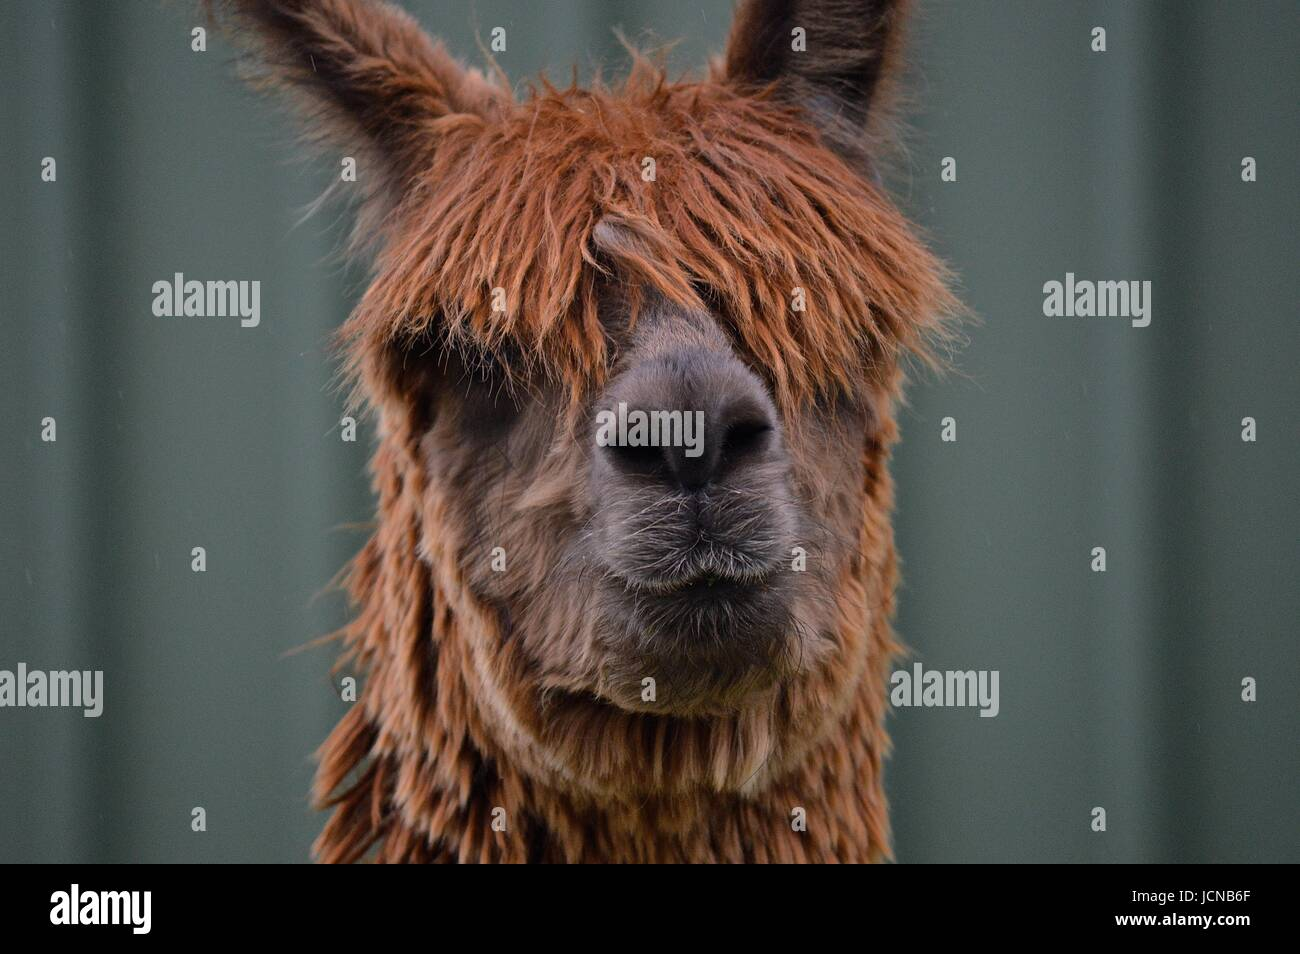 Brown suri alpaca face - Stock Image